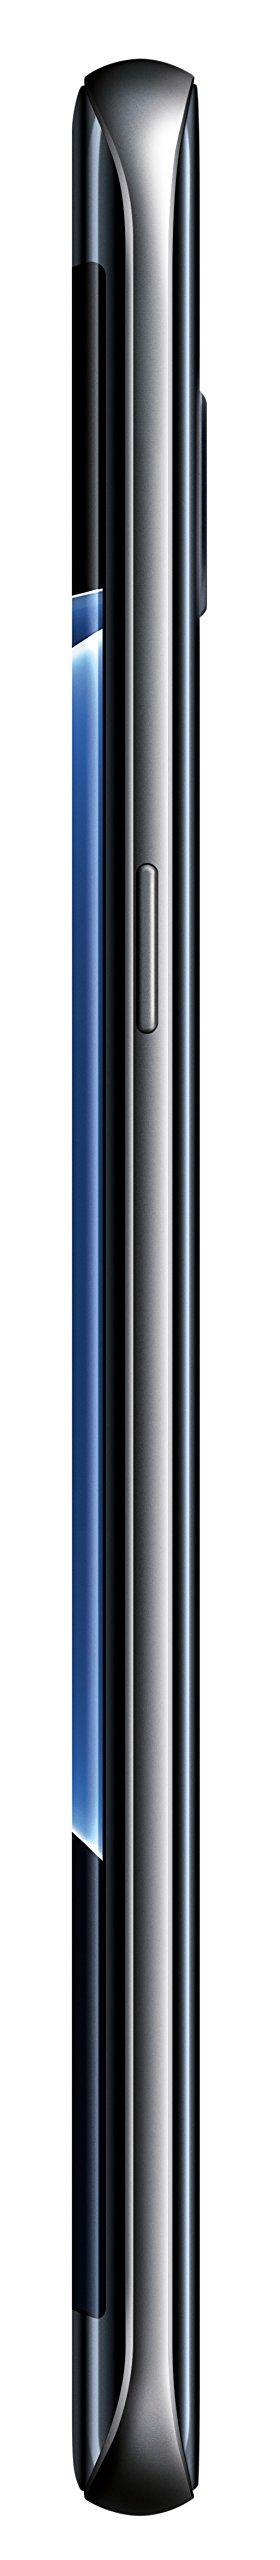 Samsung Galaxy S7 Edge G935F Factory Unlocked Phone 32 GB, No Warranty - International Version (Black Onyx) by Samsung (Image #5)